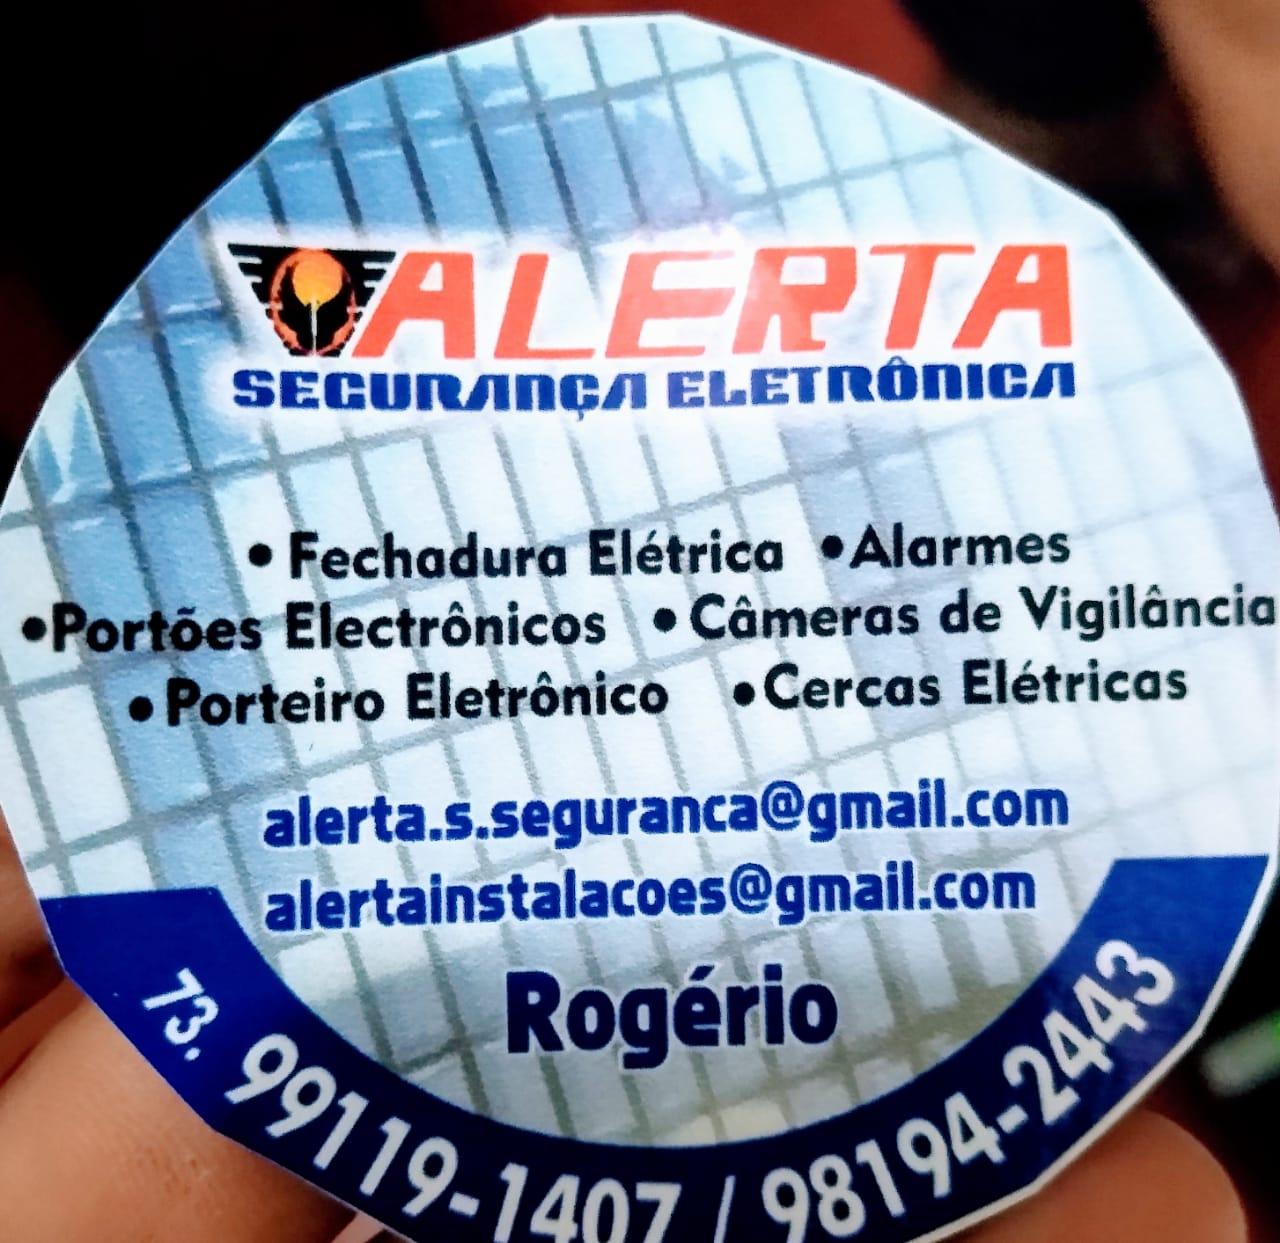 ALERTA SEGURANAÇA ELETRONICA